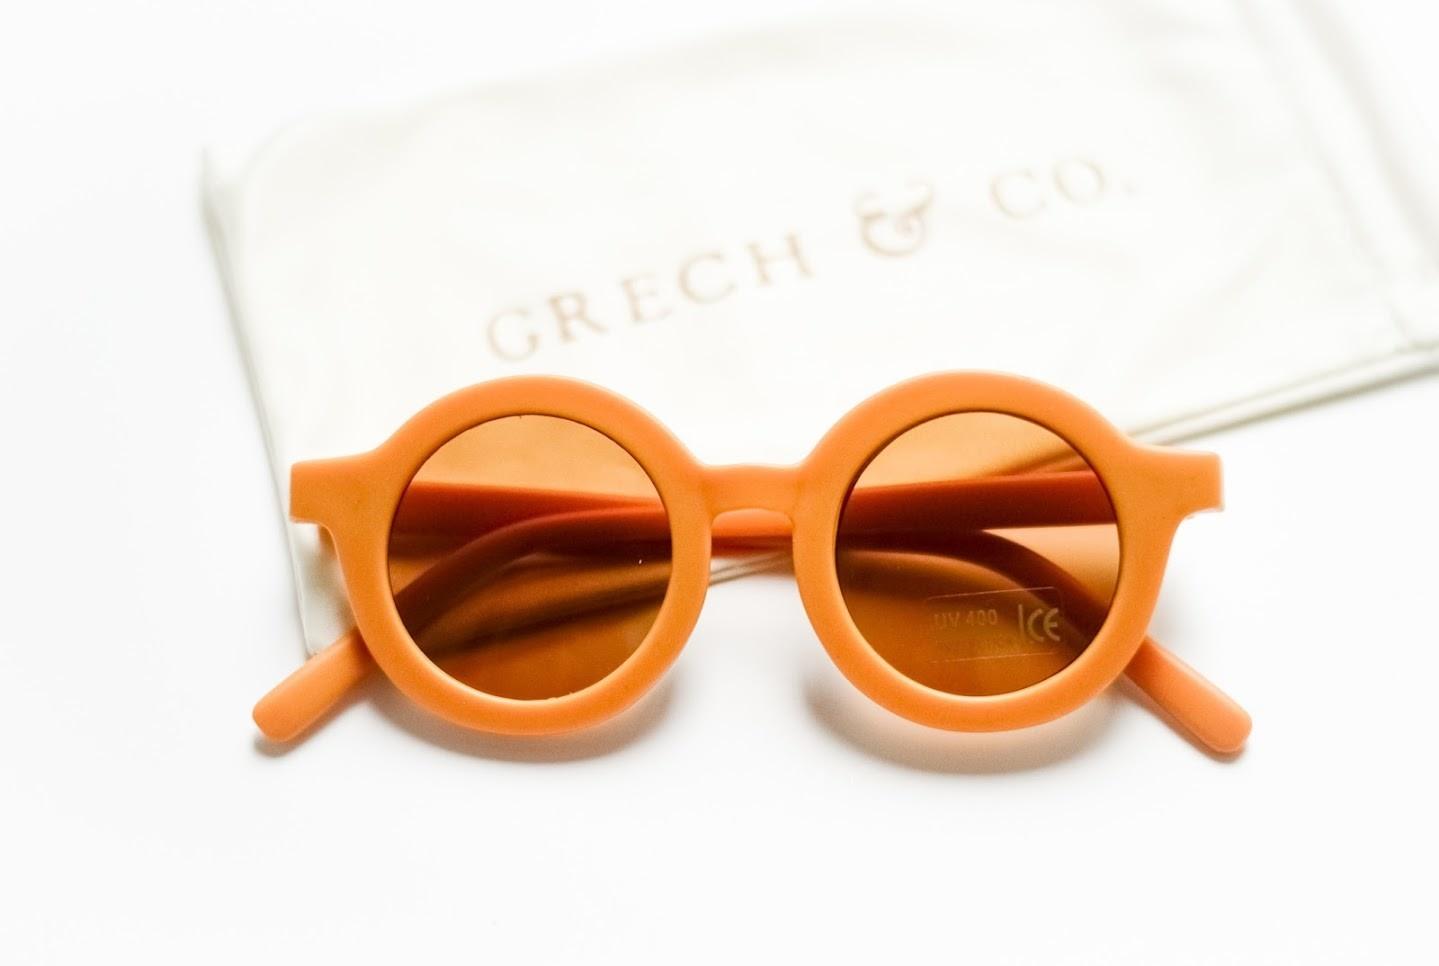 Grech & Co Grech & Co - Sunglasses UV400 - Golden